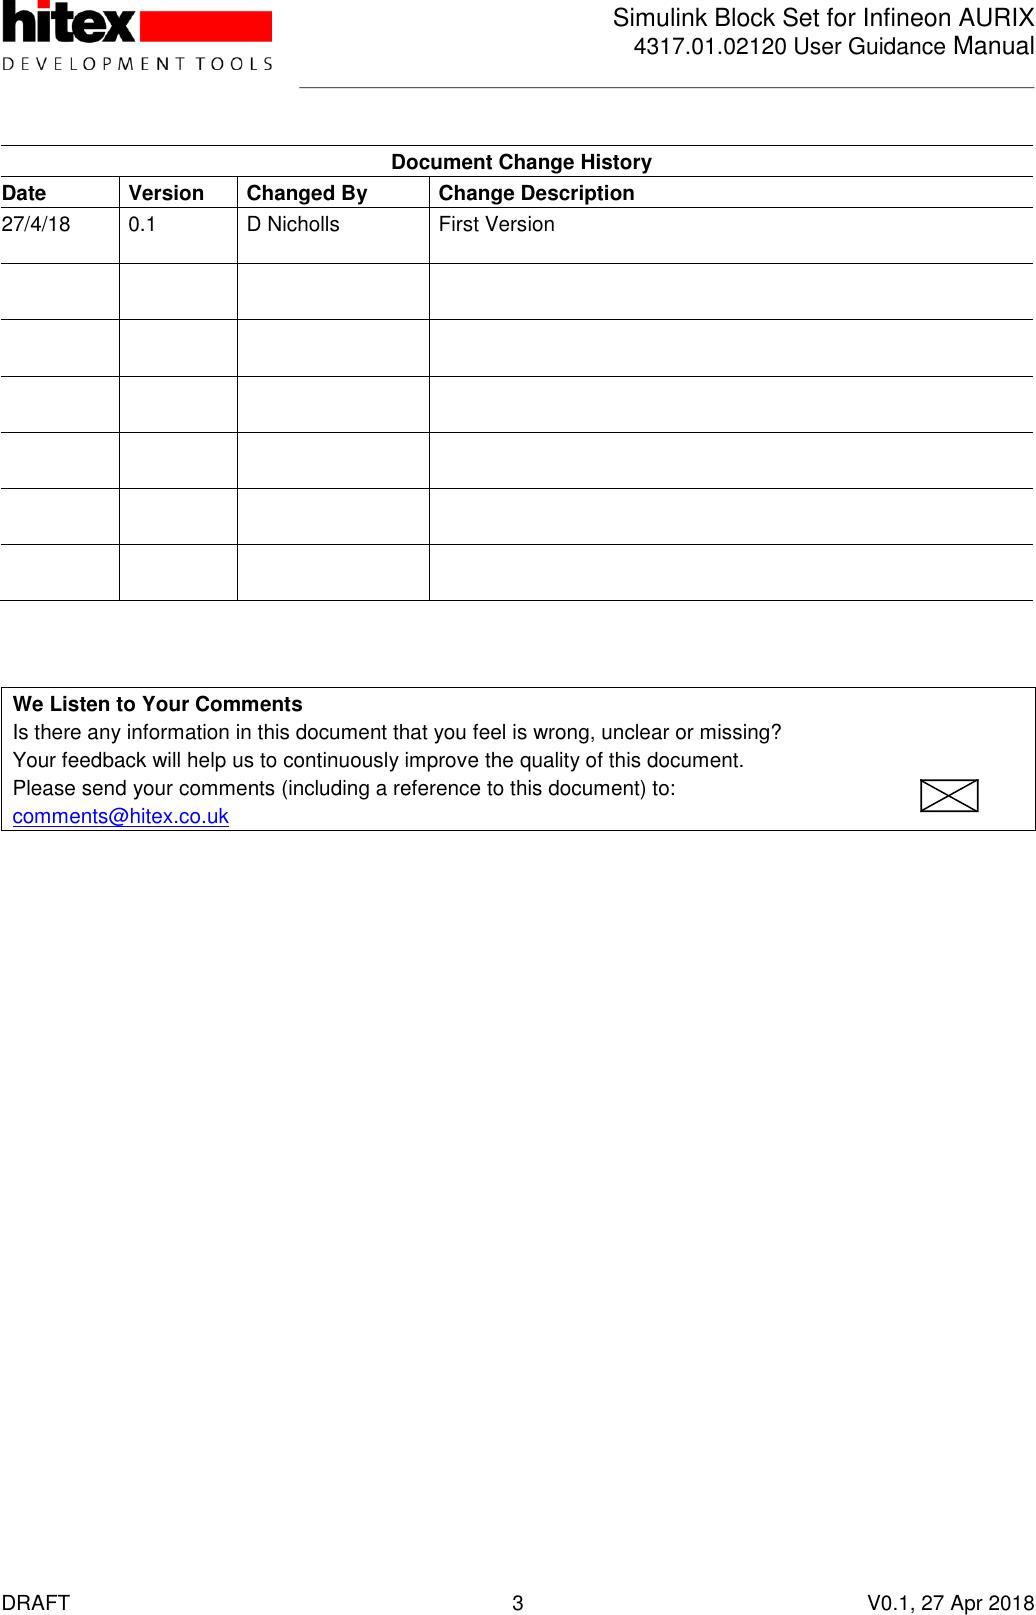 User Guidance Manual 4317 01 02120 AURIX Simulink Blockset